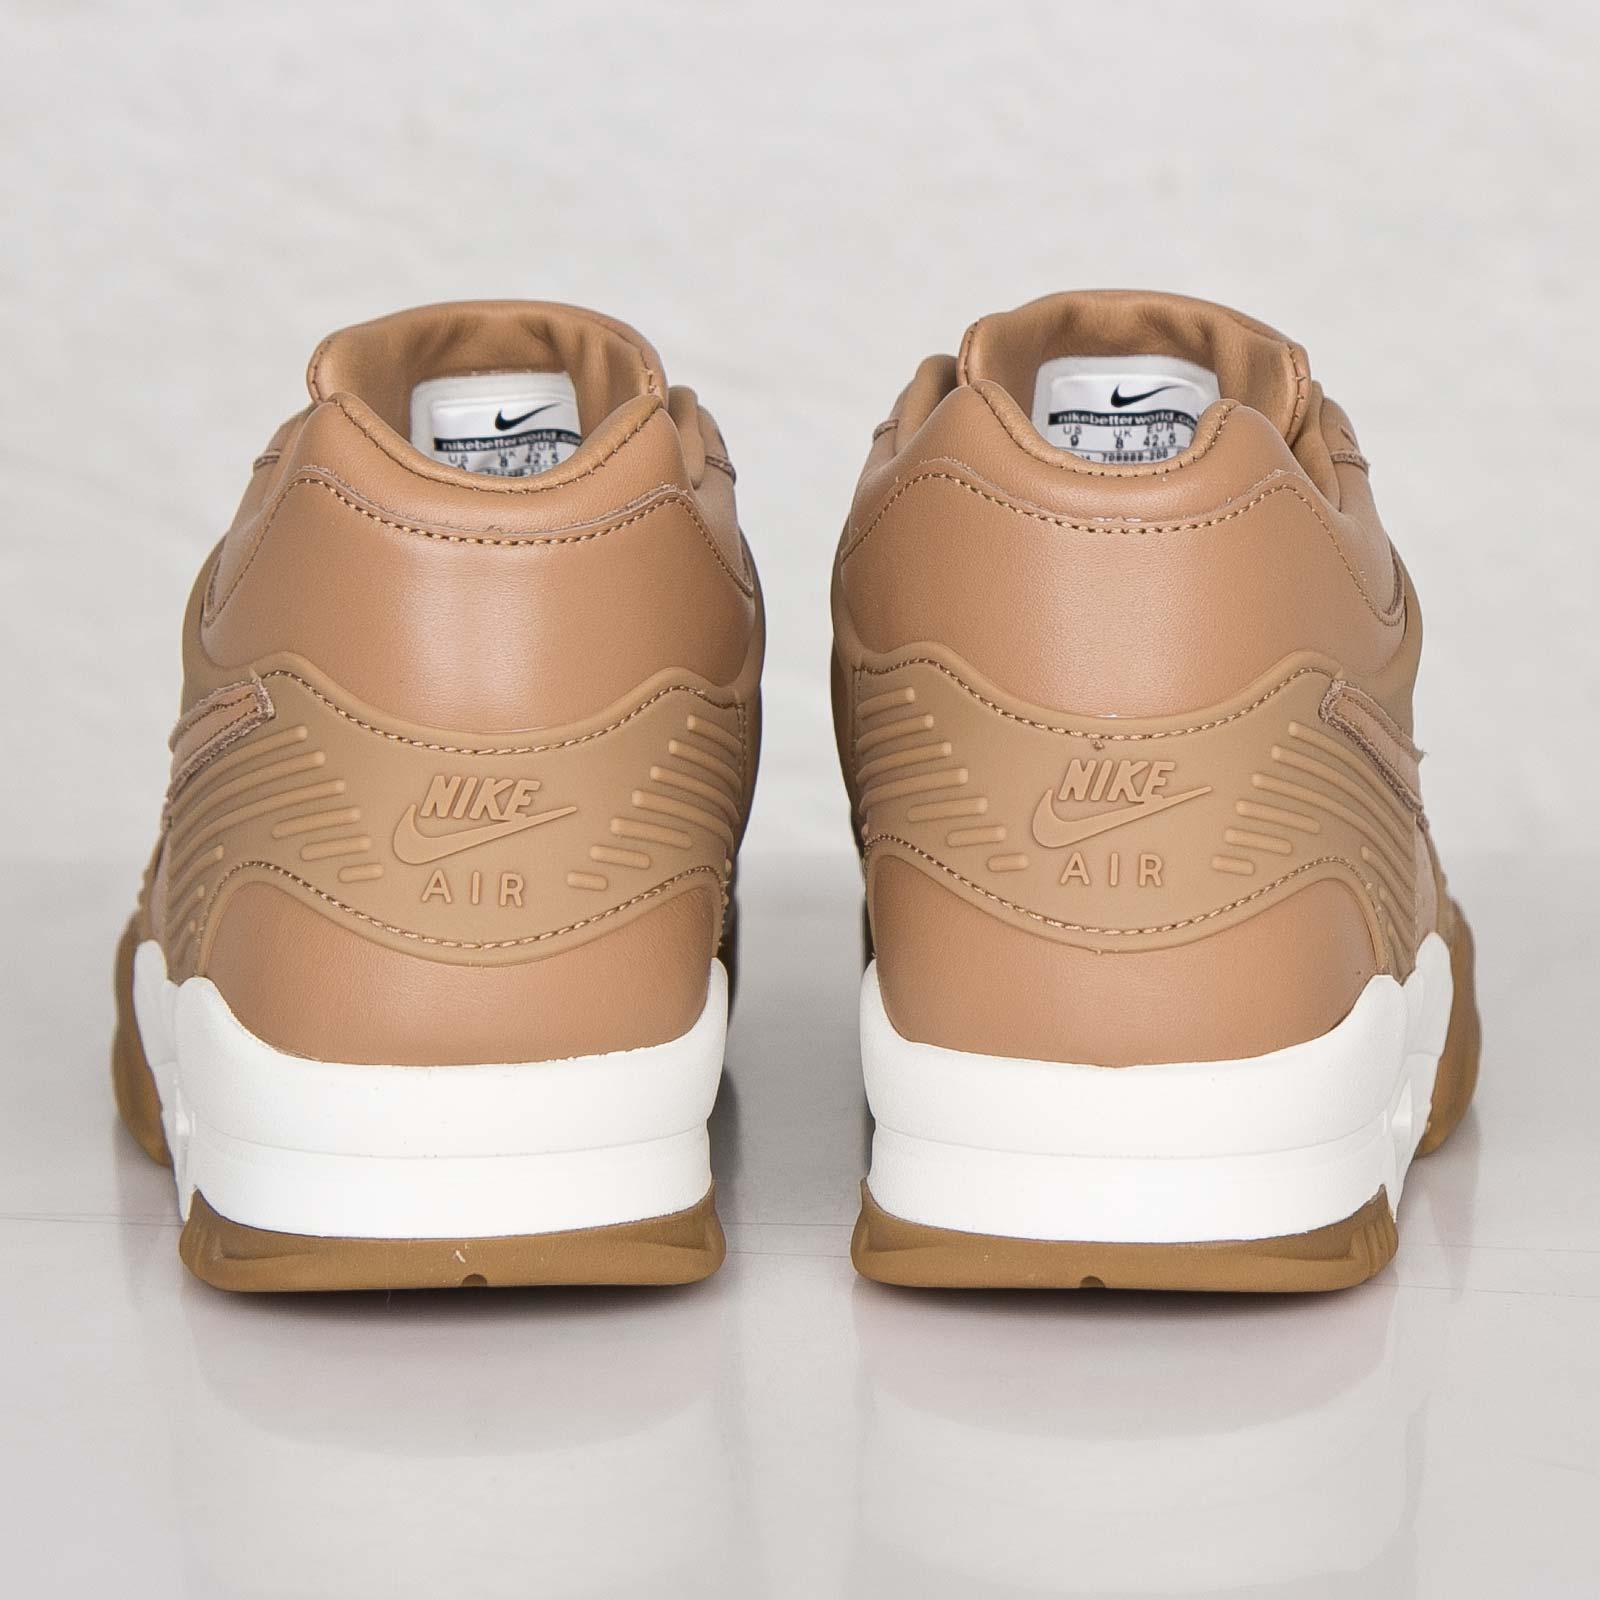 newest f4a18 435d1 Nike Air Trainer 3 Premium QS - 709989-200 - Sneakersnstuff   sneakers    streetwear online since 1999